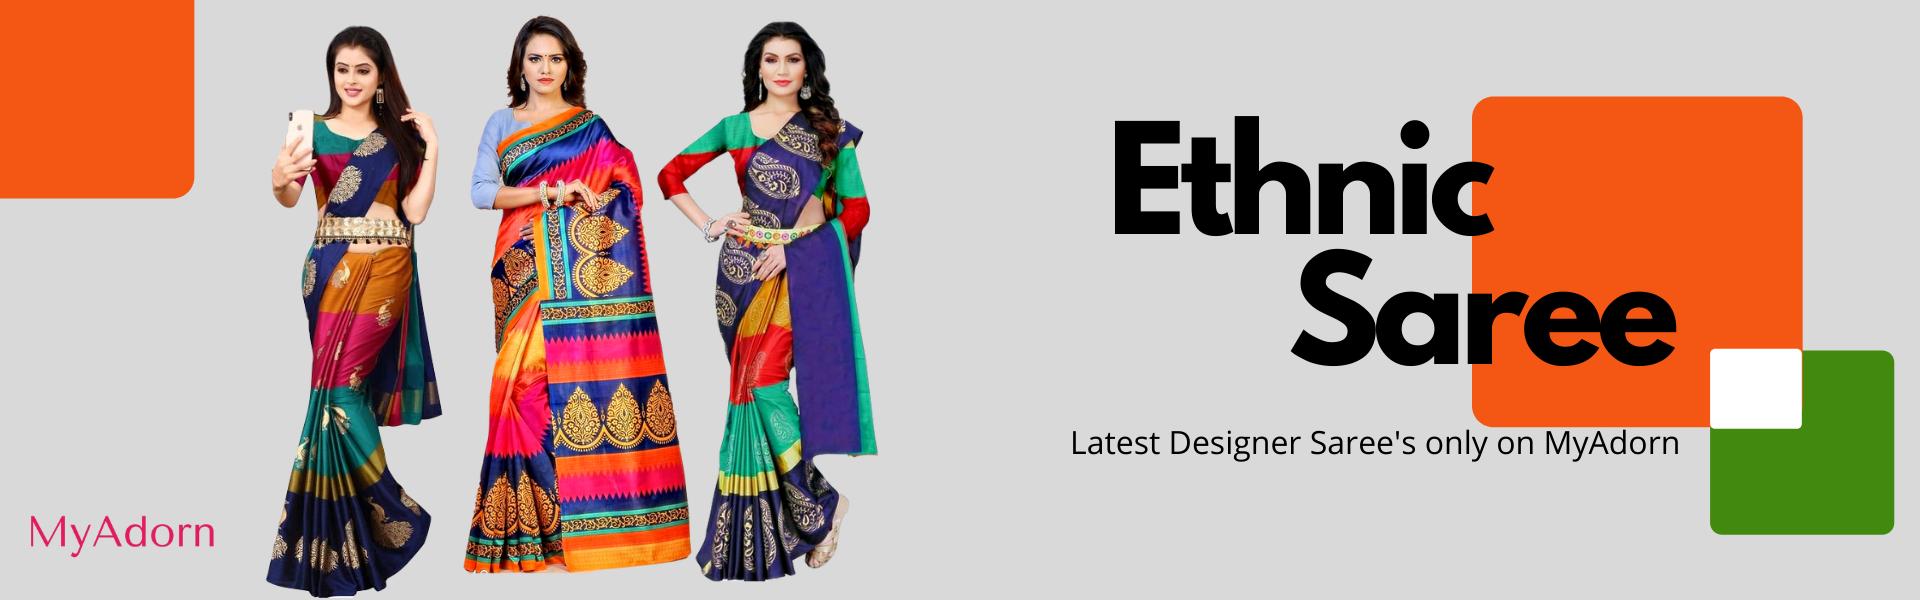 Ethnic saree myadorn banner